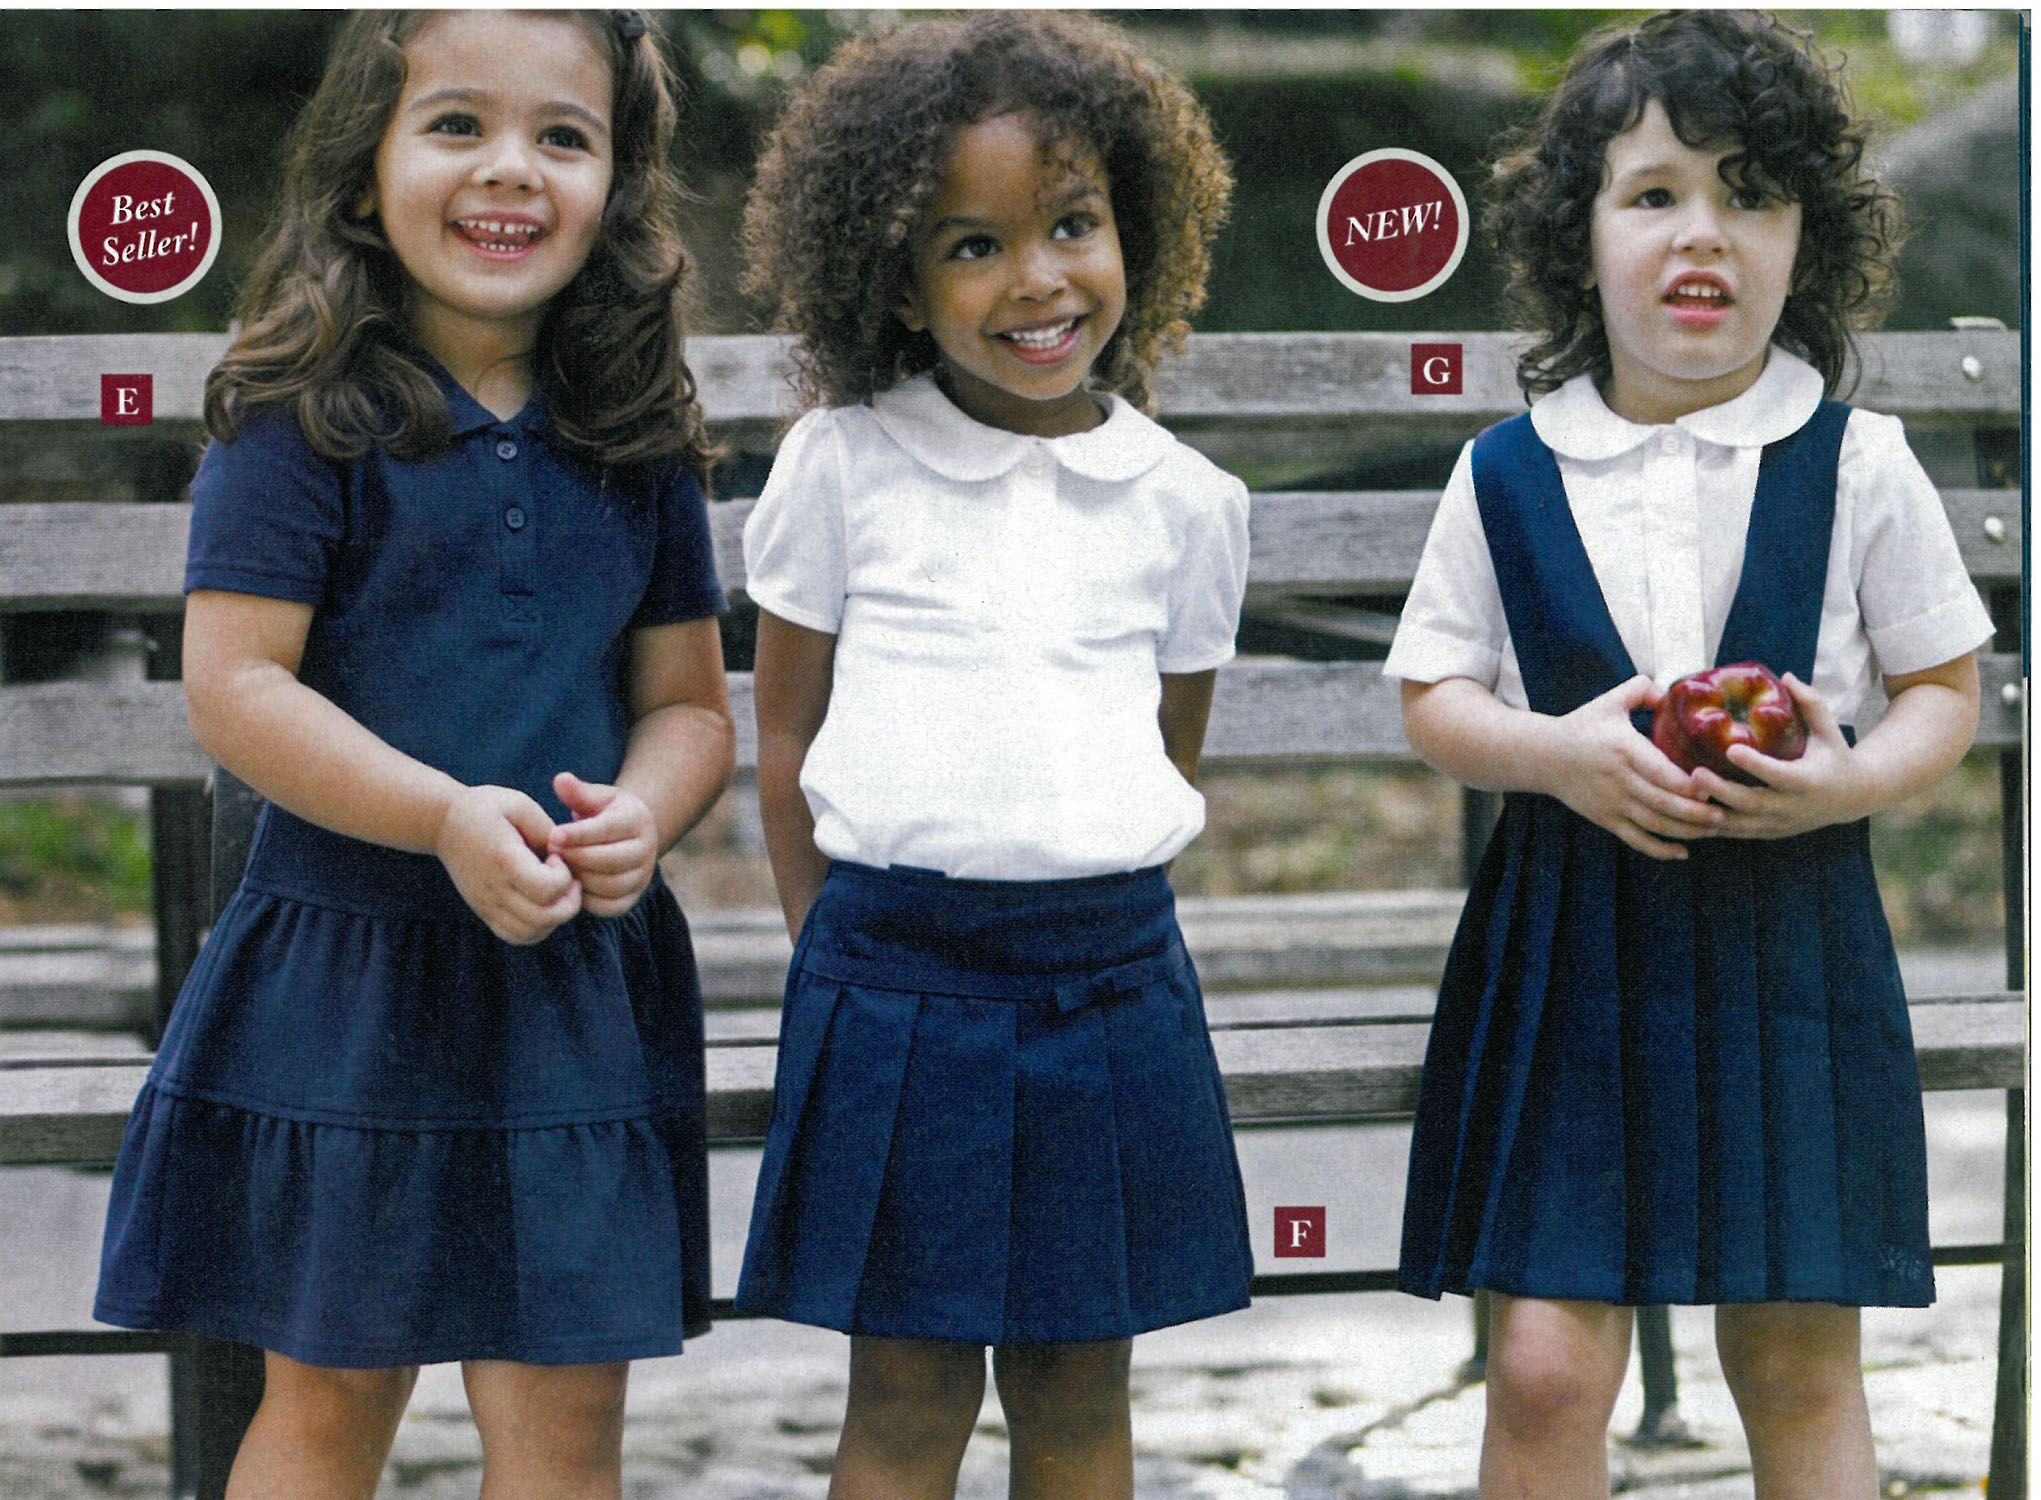 school uniforms little girls